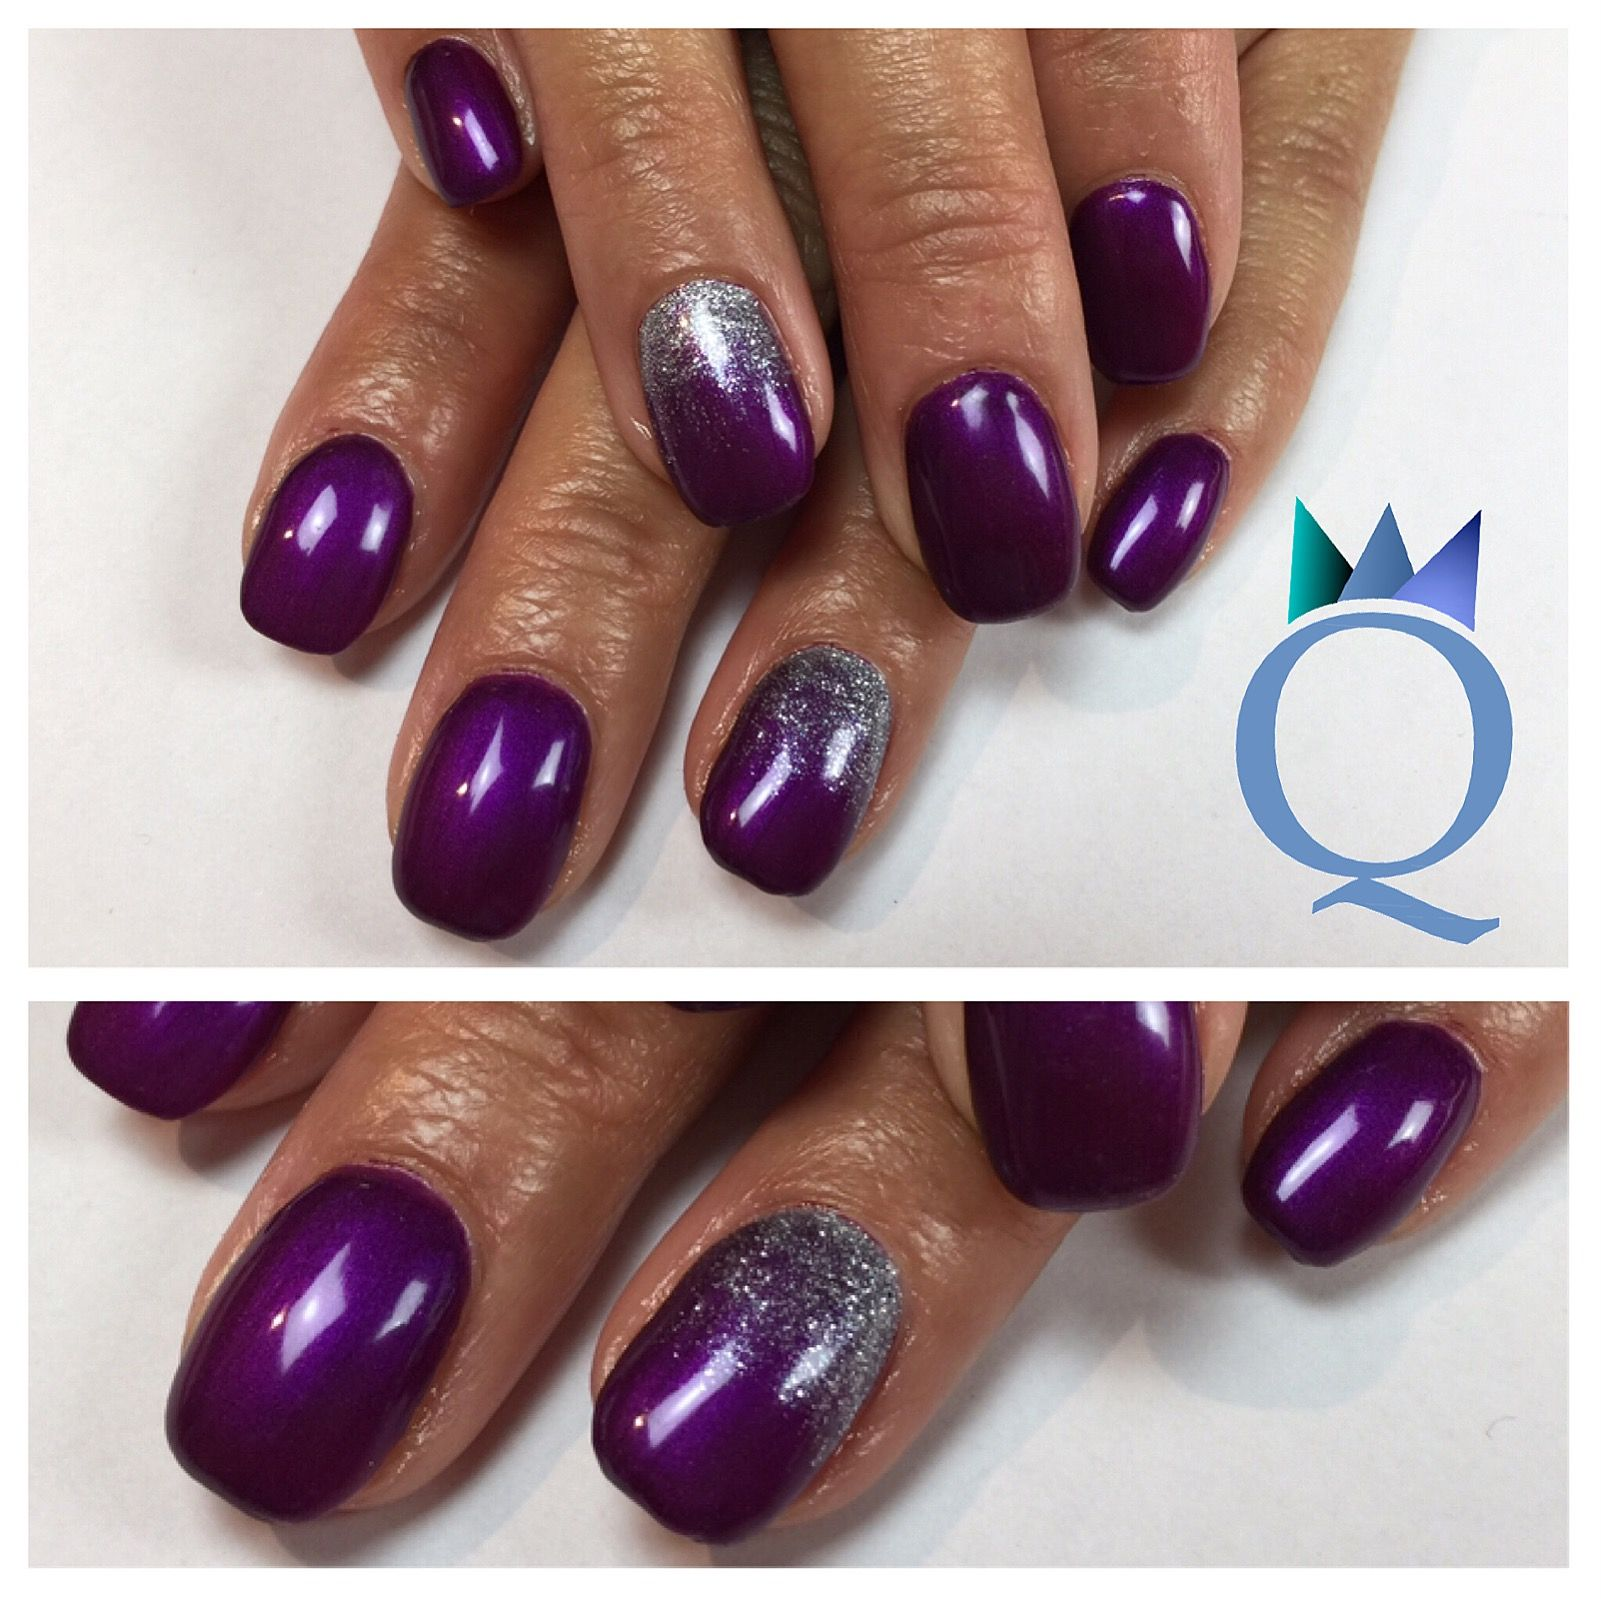 Shortnails Gelnails Nails Purple Silver Glitter Kurzenagel